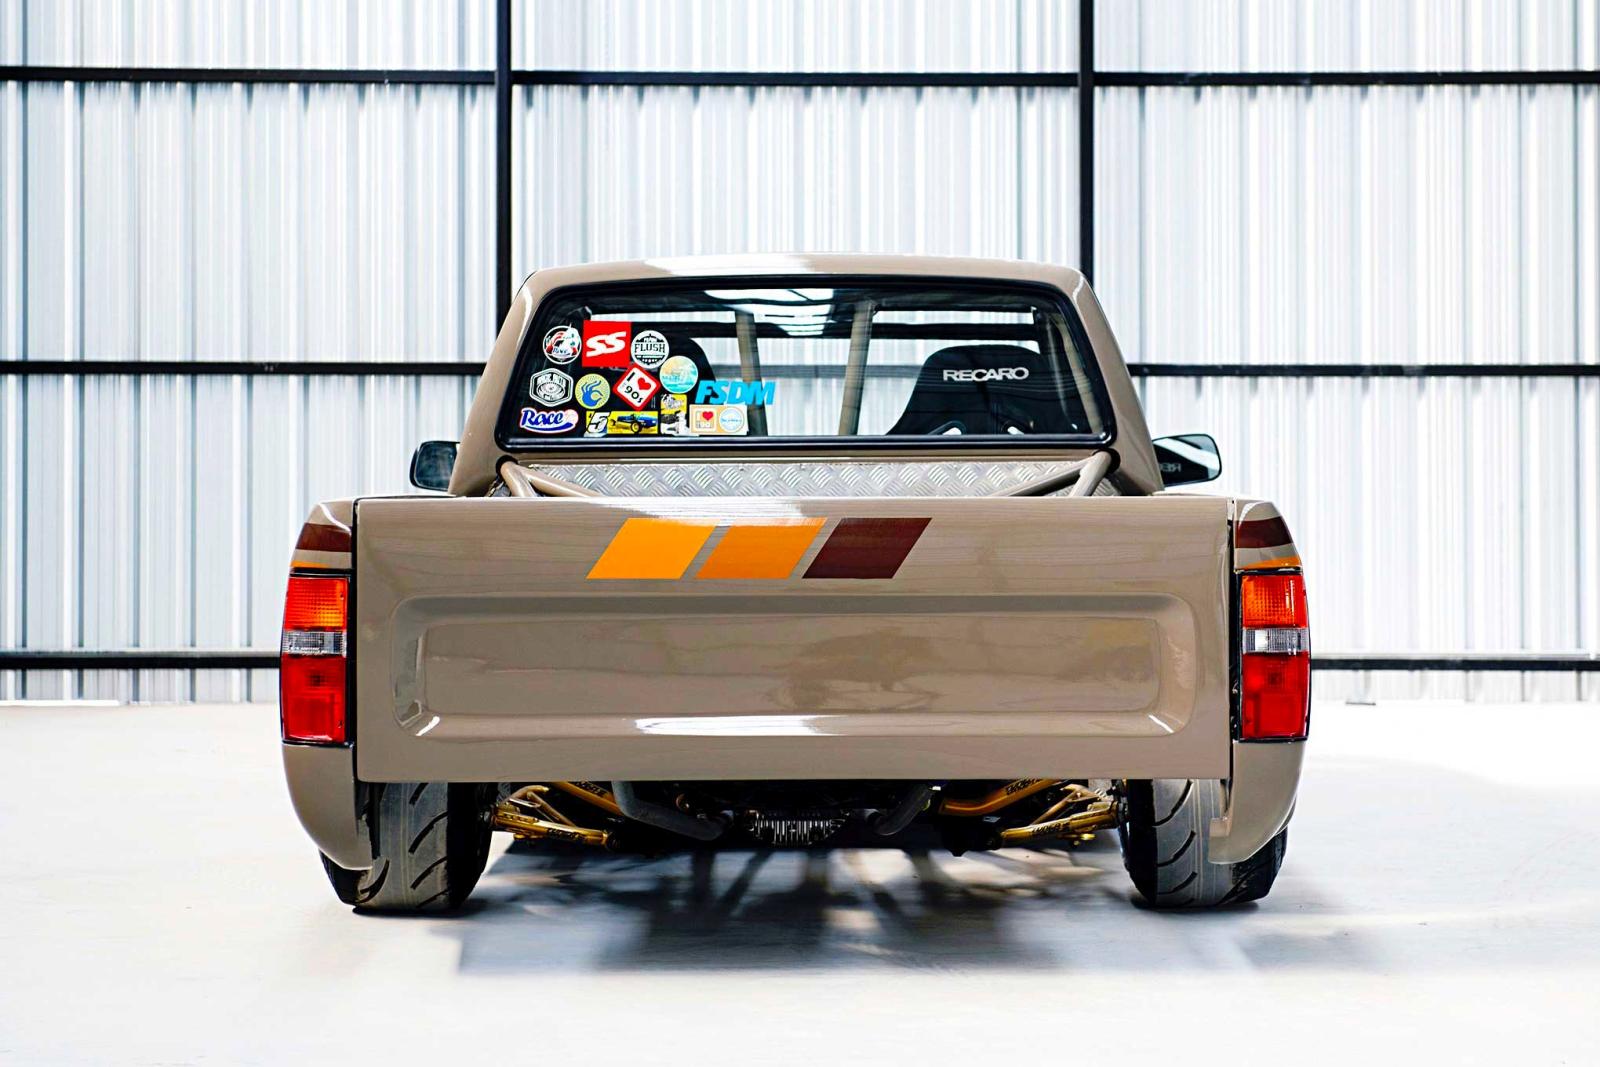 1991 Toyota Hilux Mighty-X